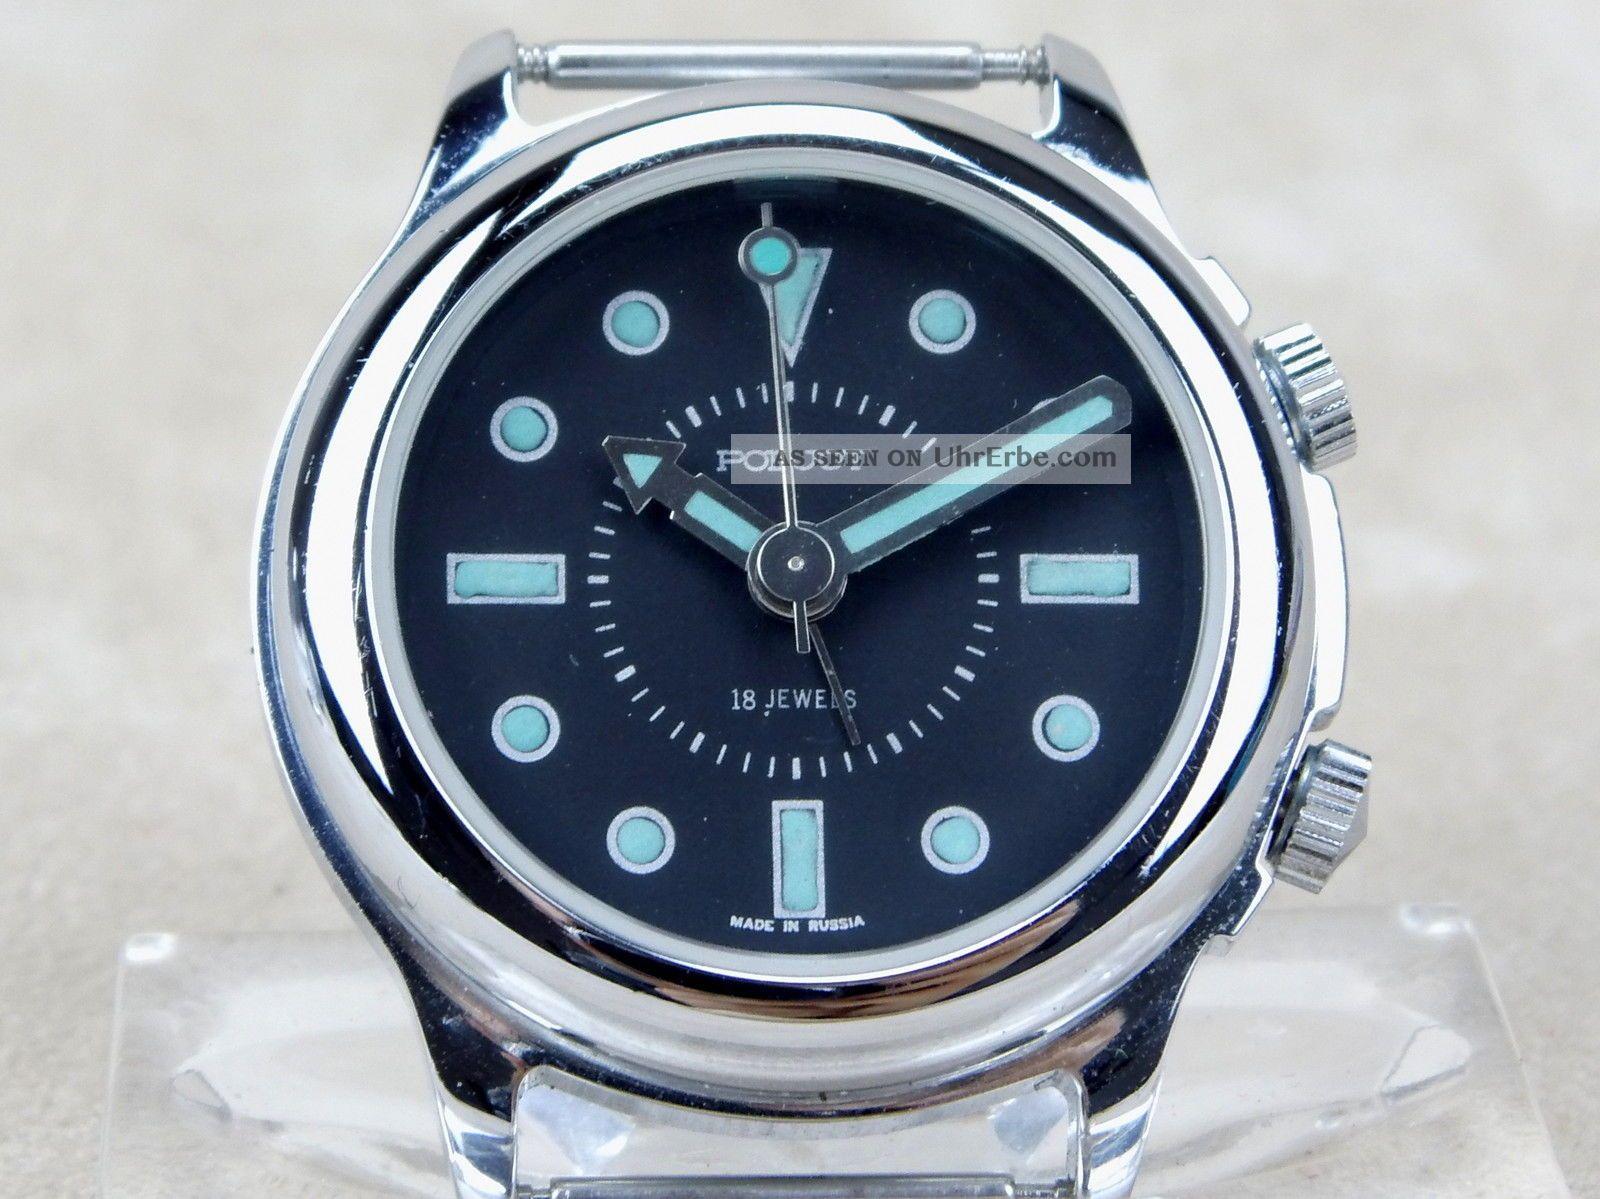 Poljot Armbanduhr Mit Weckfunktion Alarm Wecker Handaufzug Armbanduhren Bild